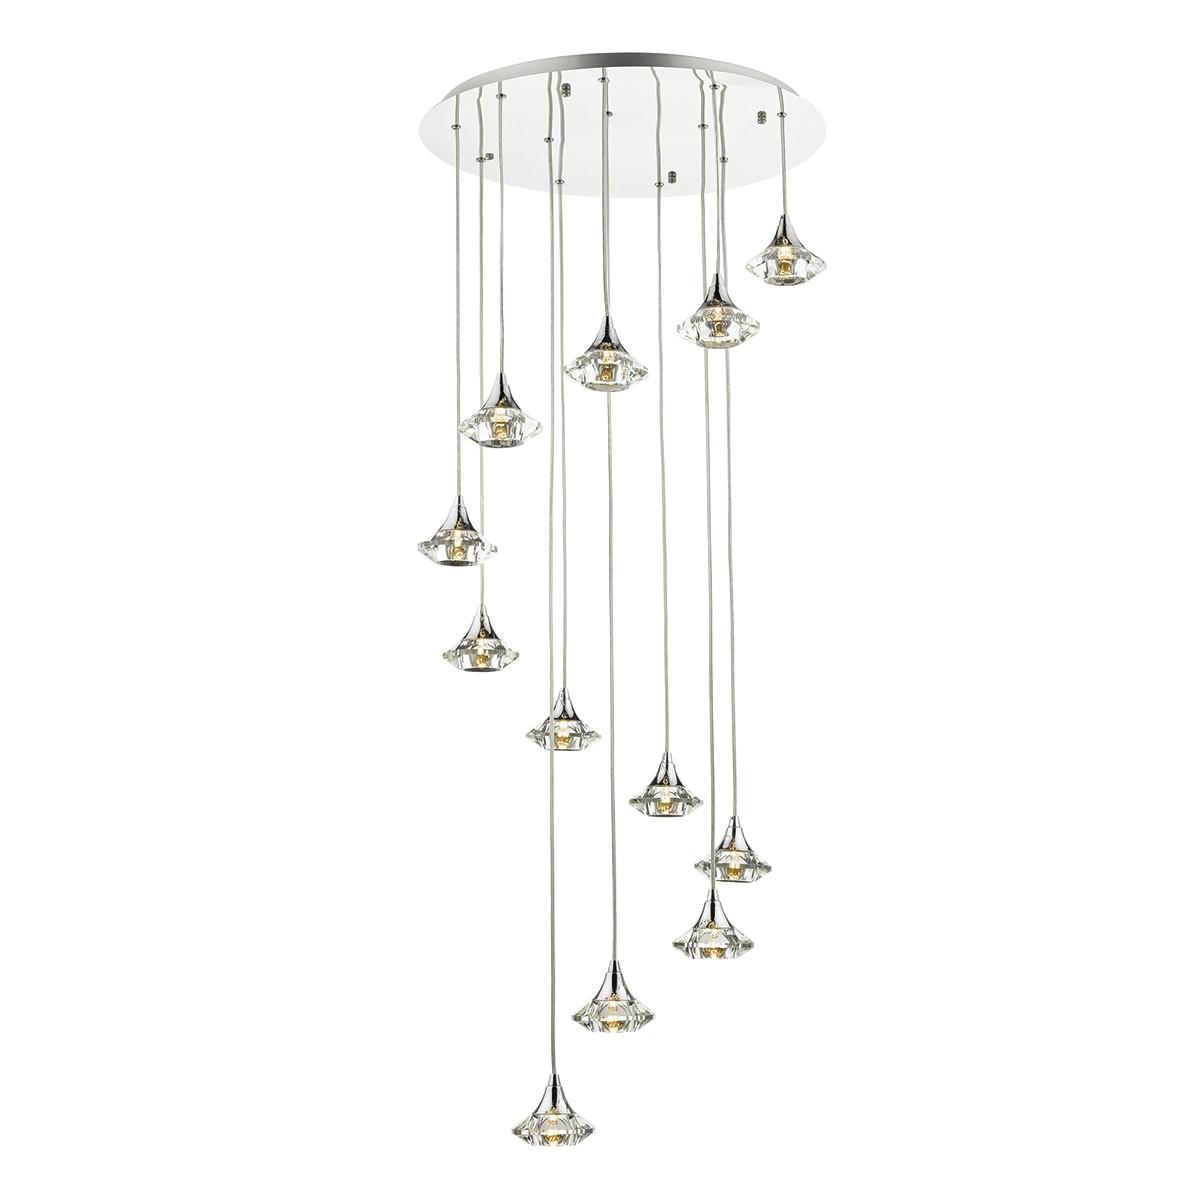 Luther 12 light spiral pendant crystal glass lumination lighting luther 12 light spiral pendant crystal glass aloadofball Images